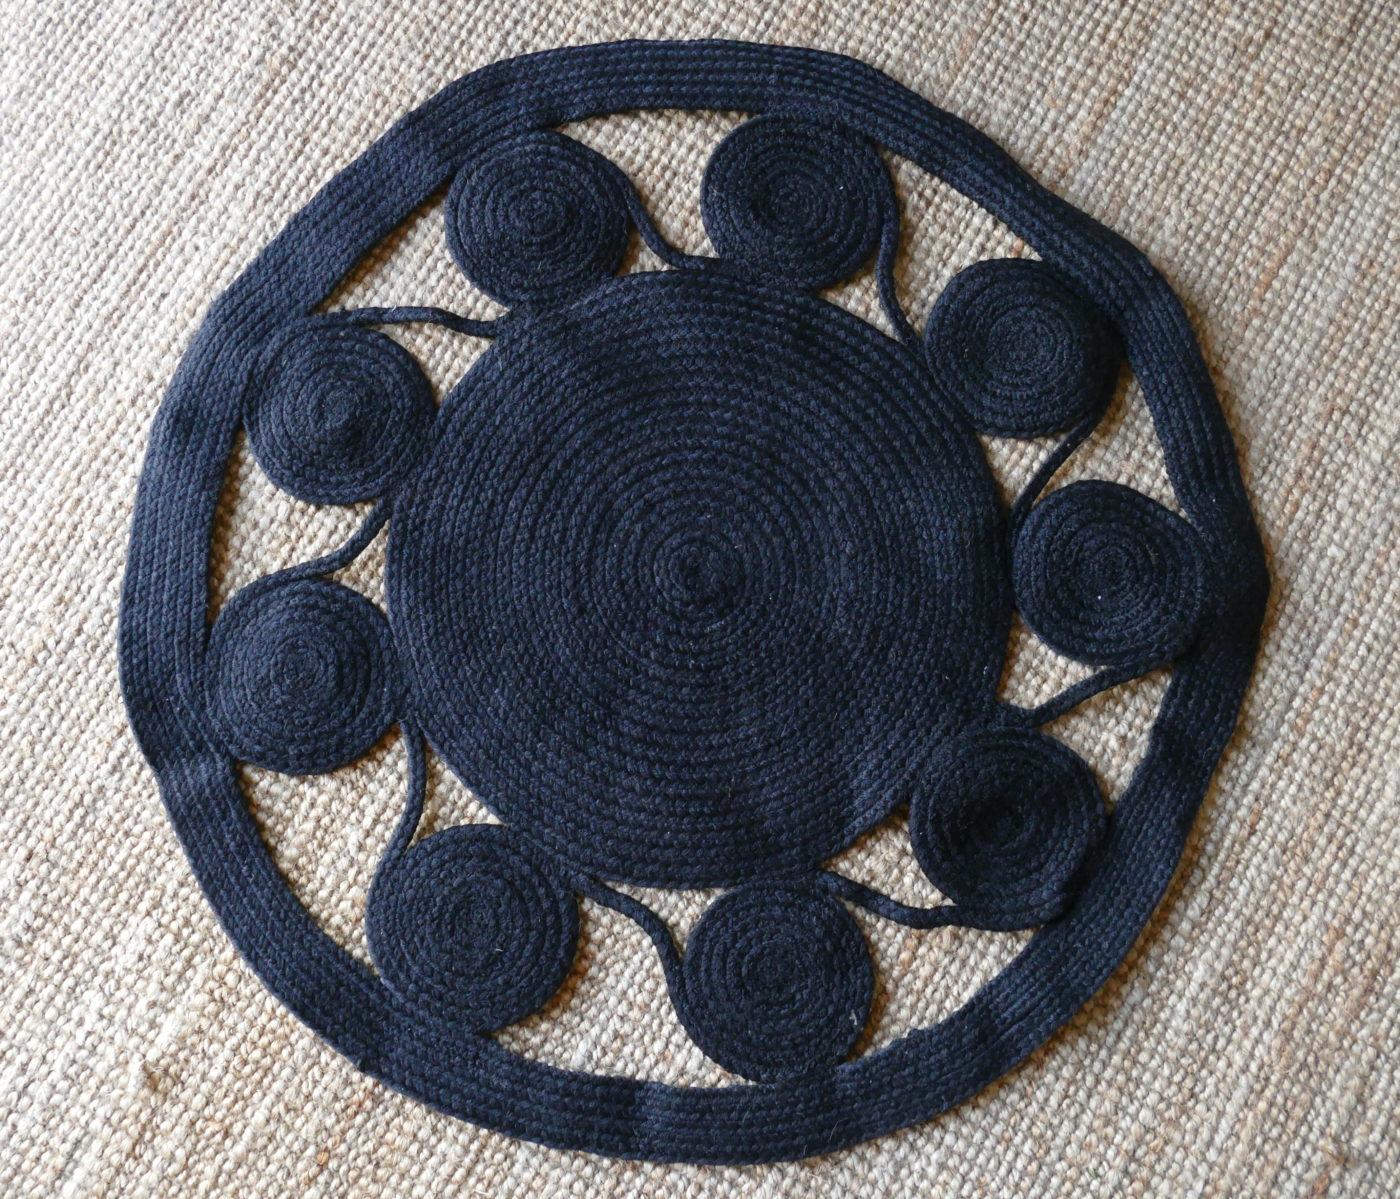 black woven rug on beige woven rug background